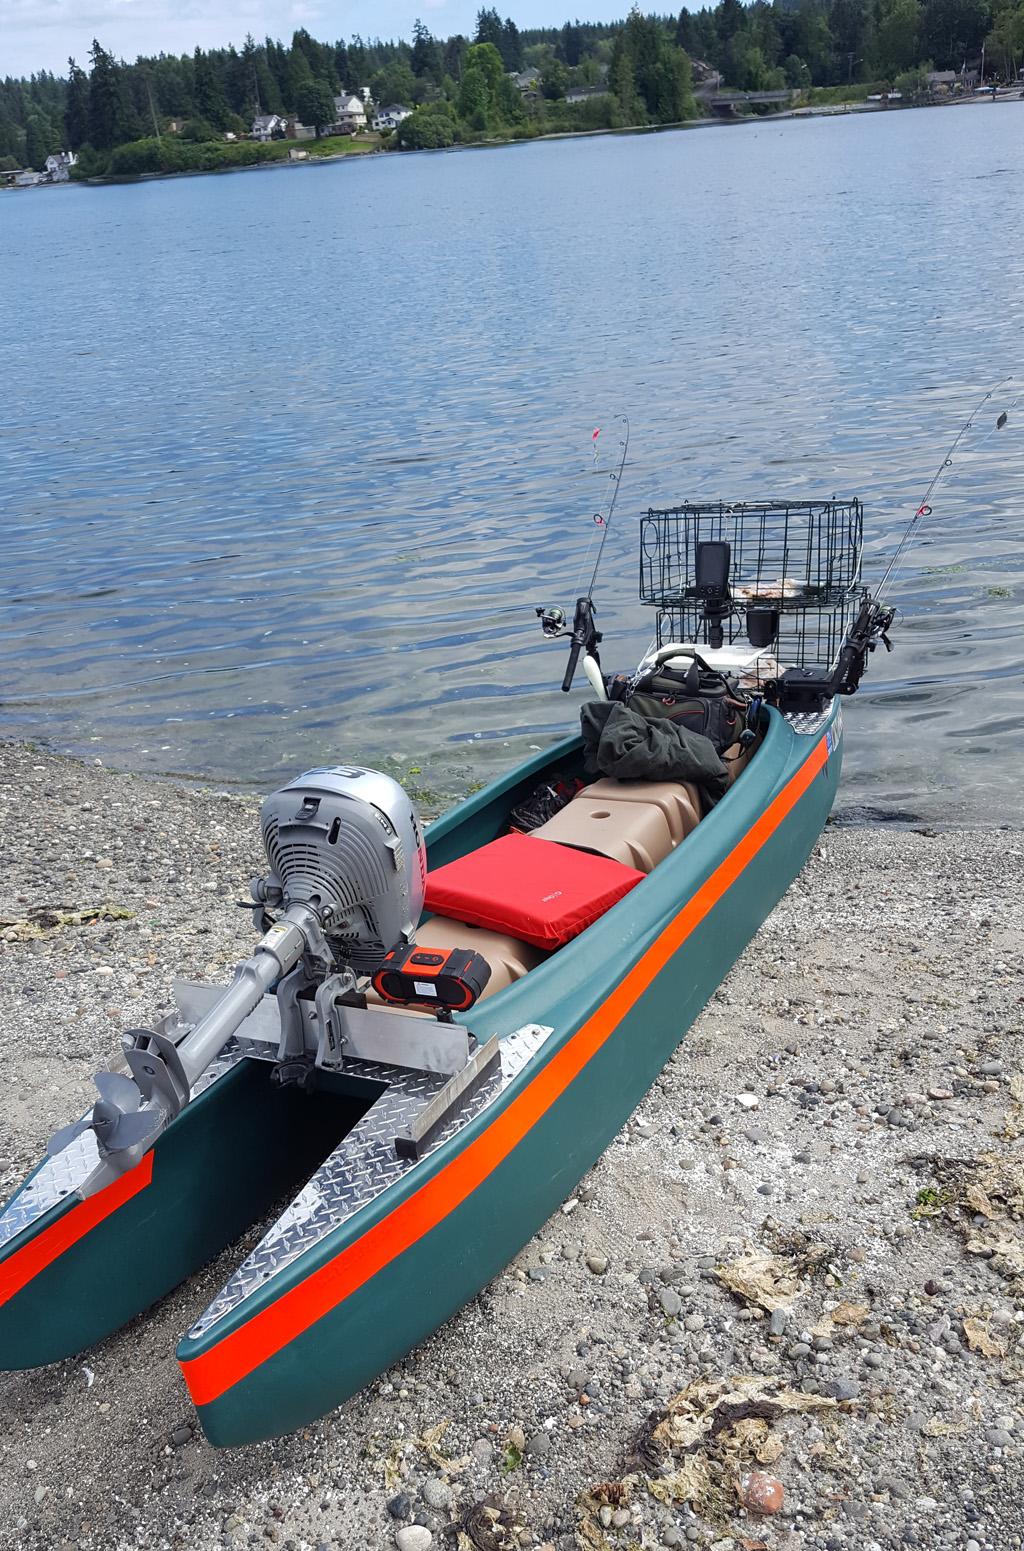 motorized-W700-on-the-beach